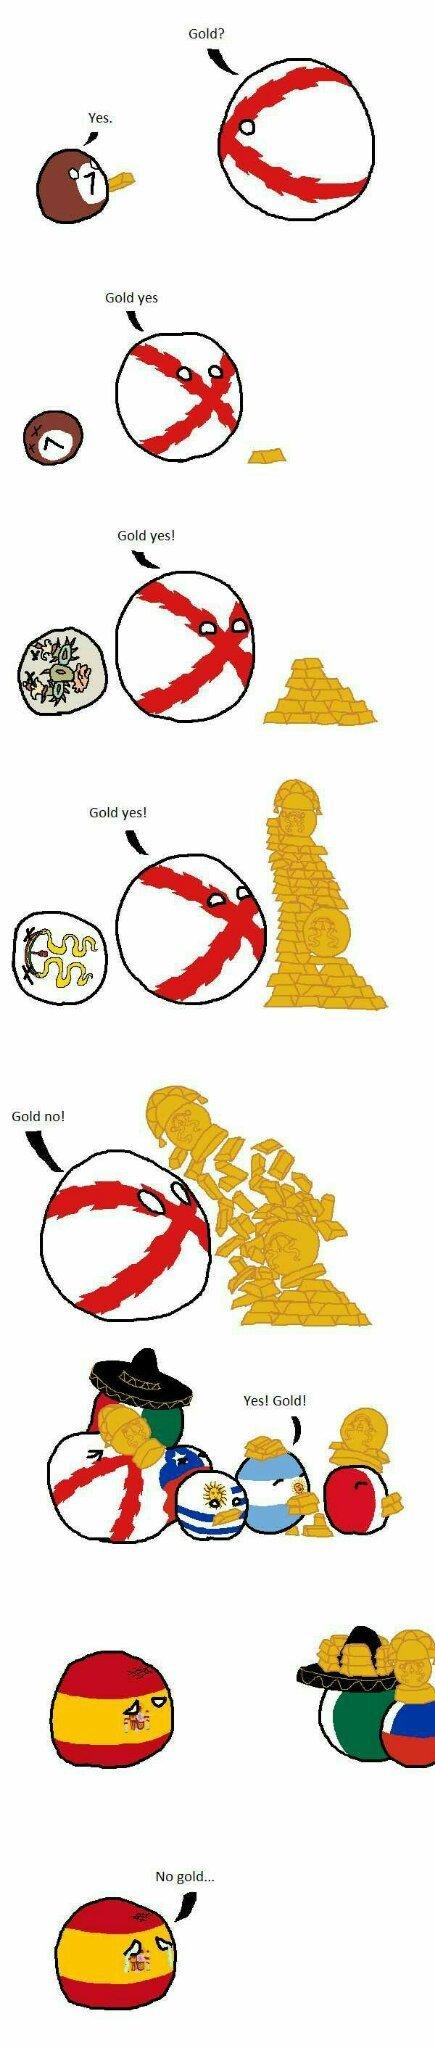 Historia de españa resumida - meme